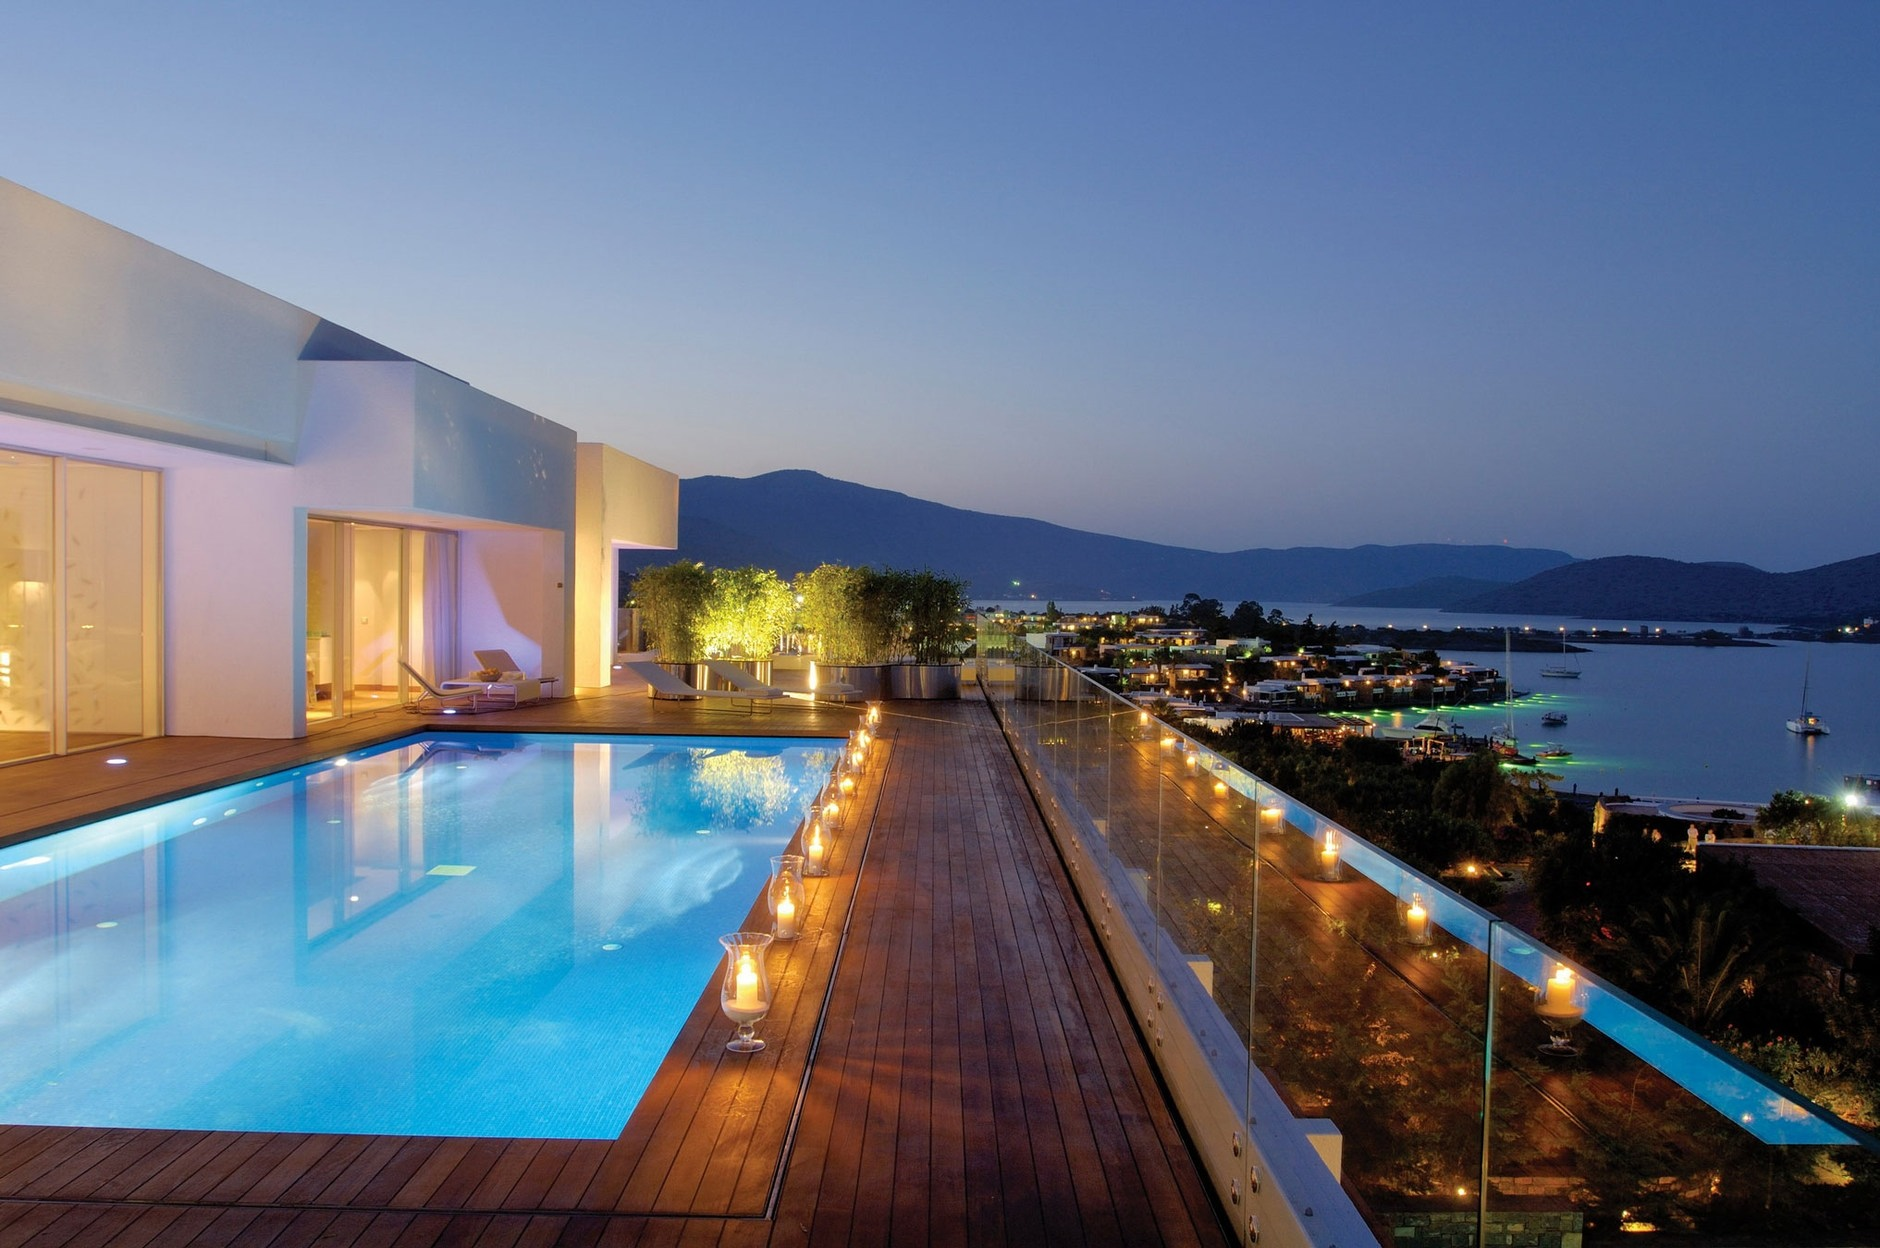 Yachting club villas at elounda beach by davide macullo for Design hotel crete